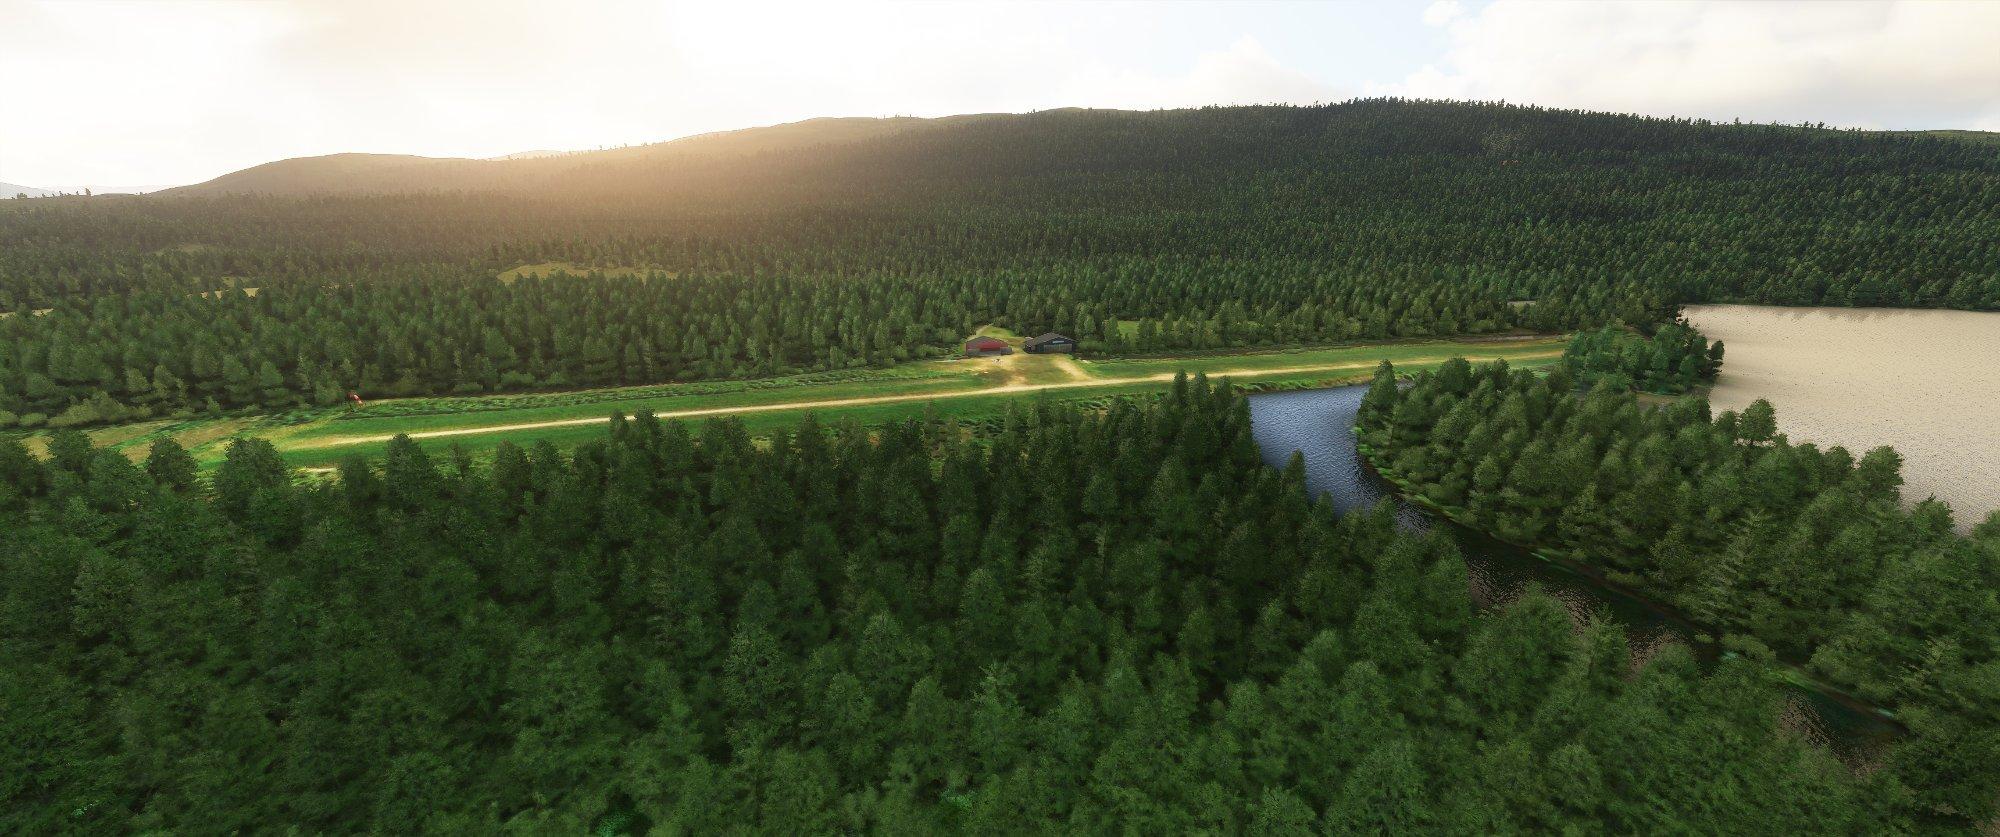 Microsoft Flight Simulator Screenshot 2020.10.03 - 00.31.21.05.jpg